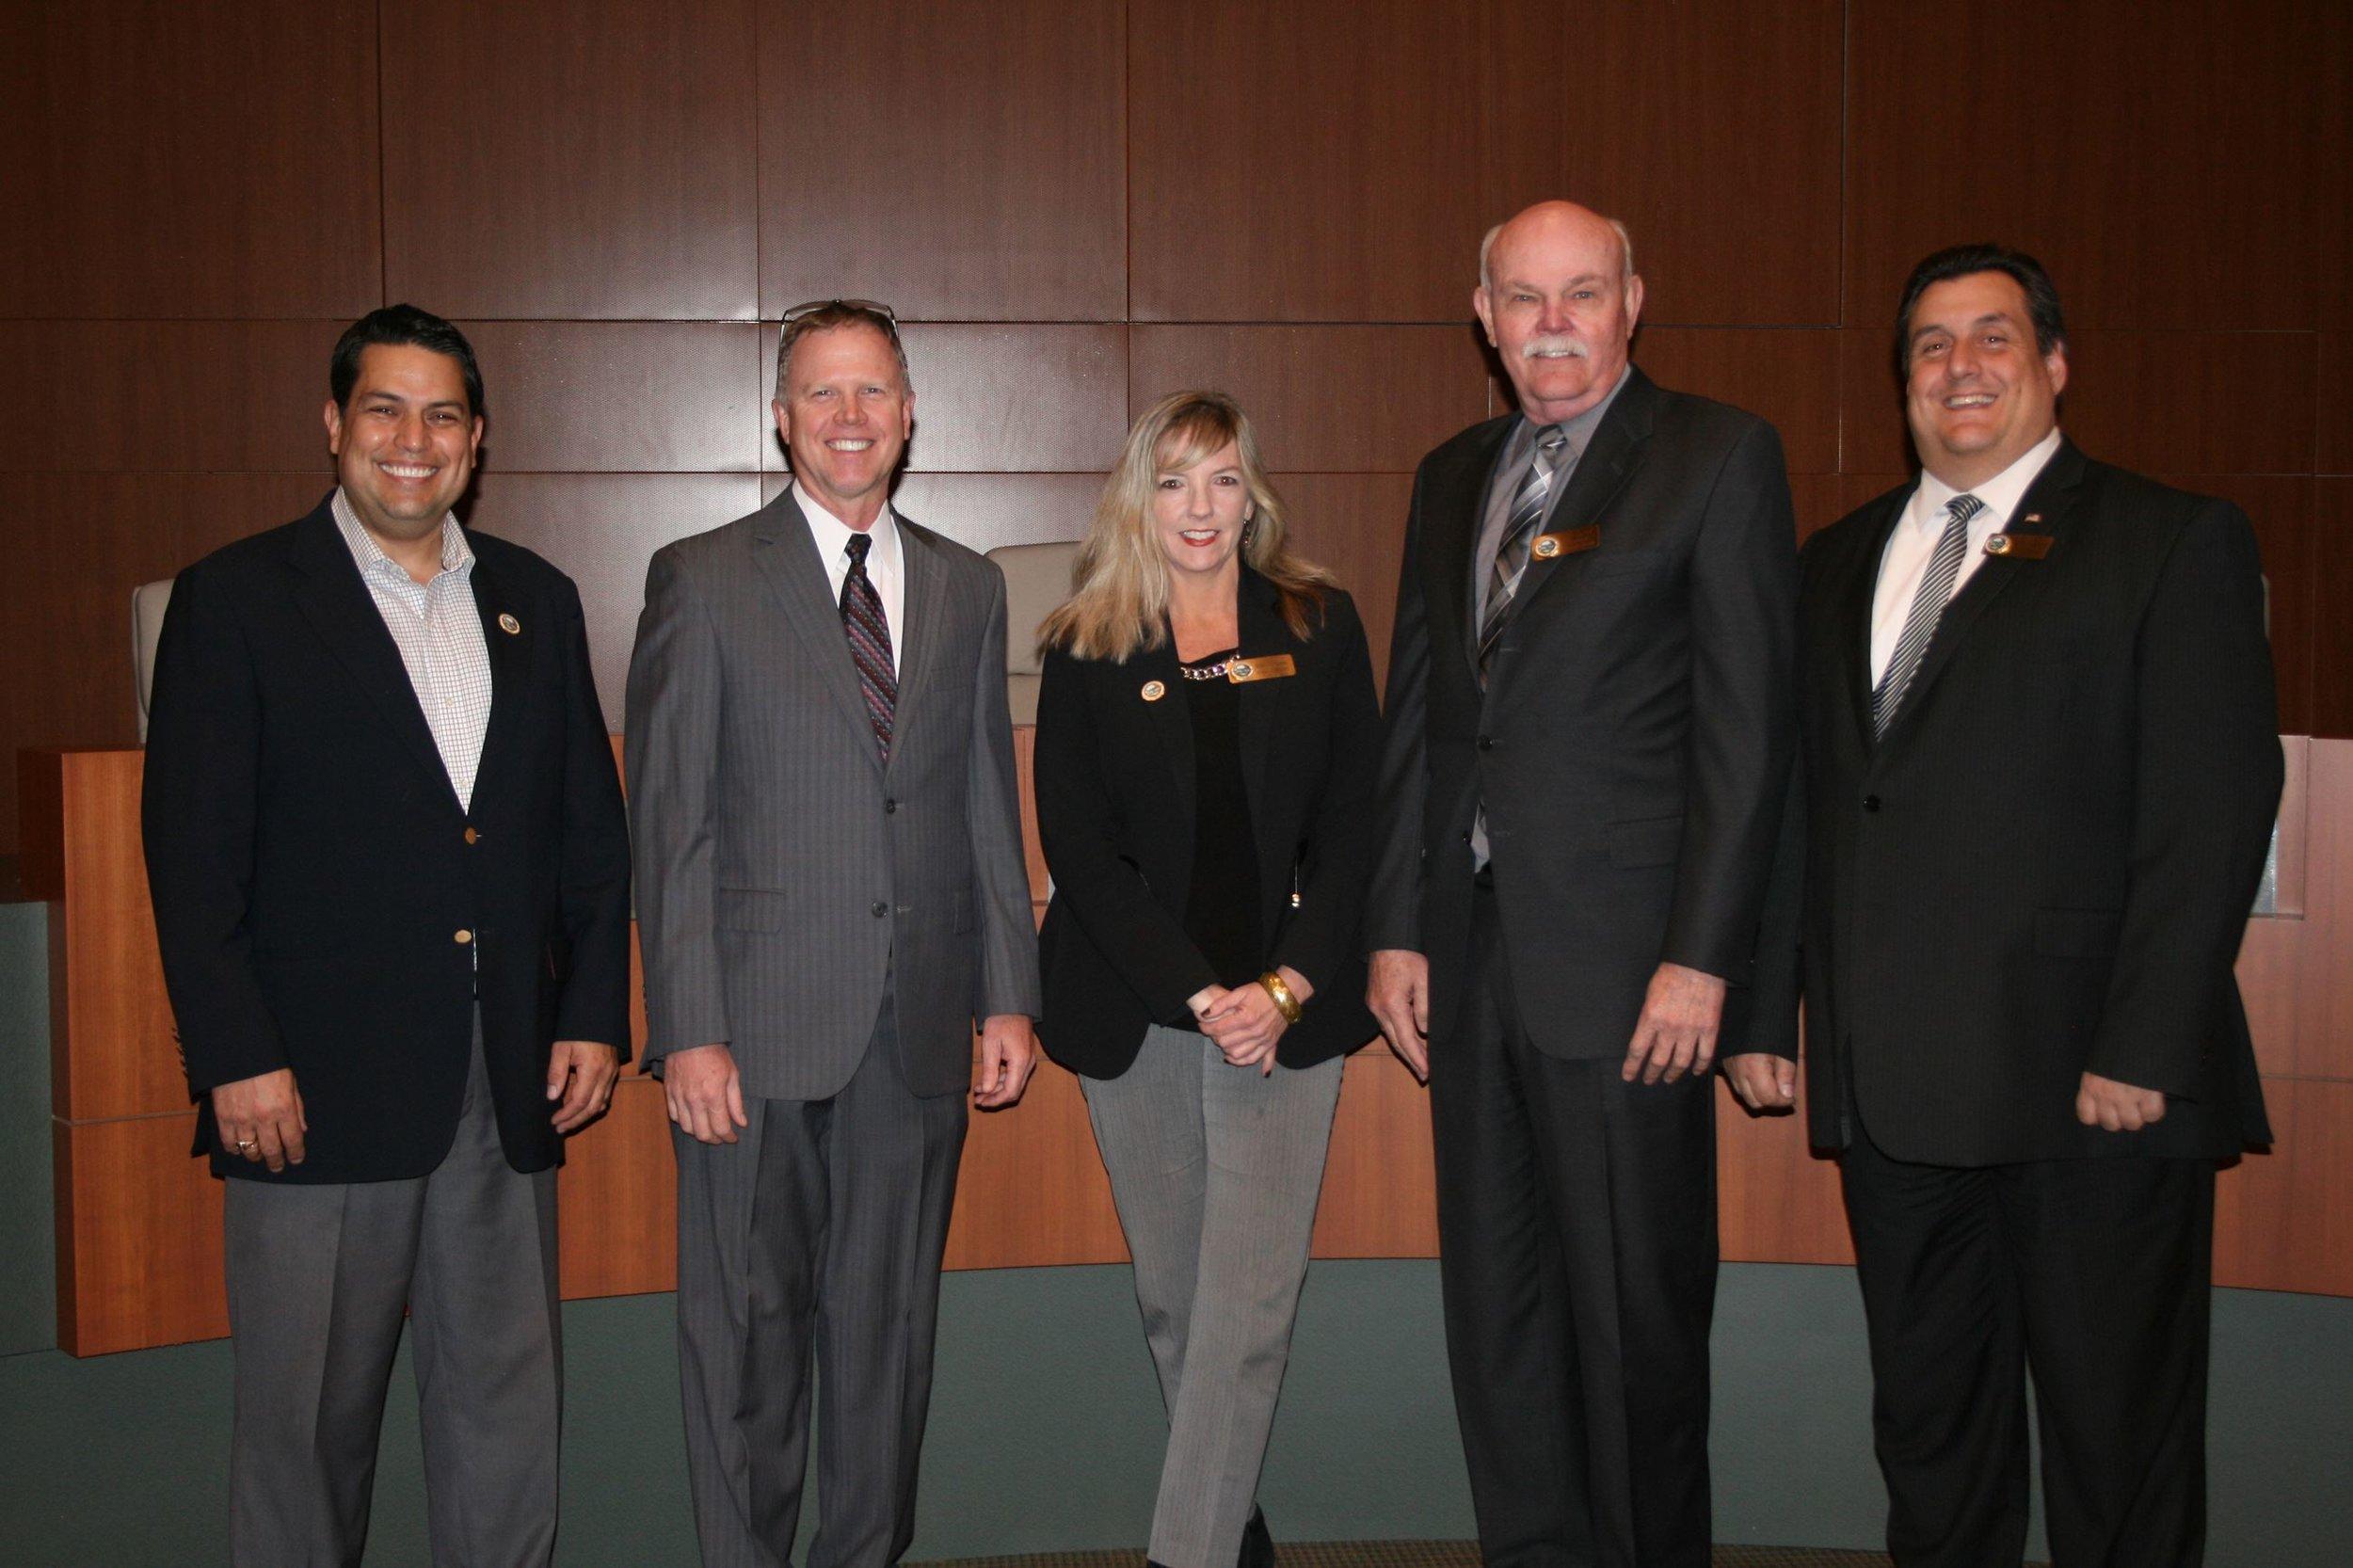 Planning Commission Members(Above) Daniel Robertson, Mark McQuaid, Anne Figueroa, Jim Eakin, John Christopoulos